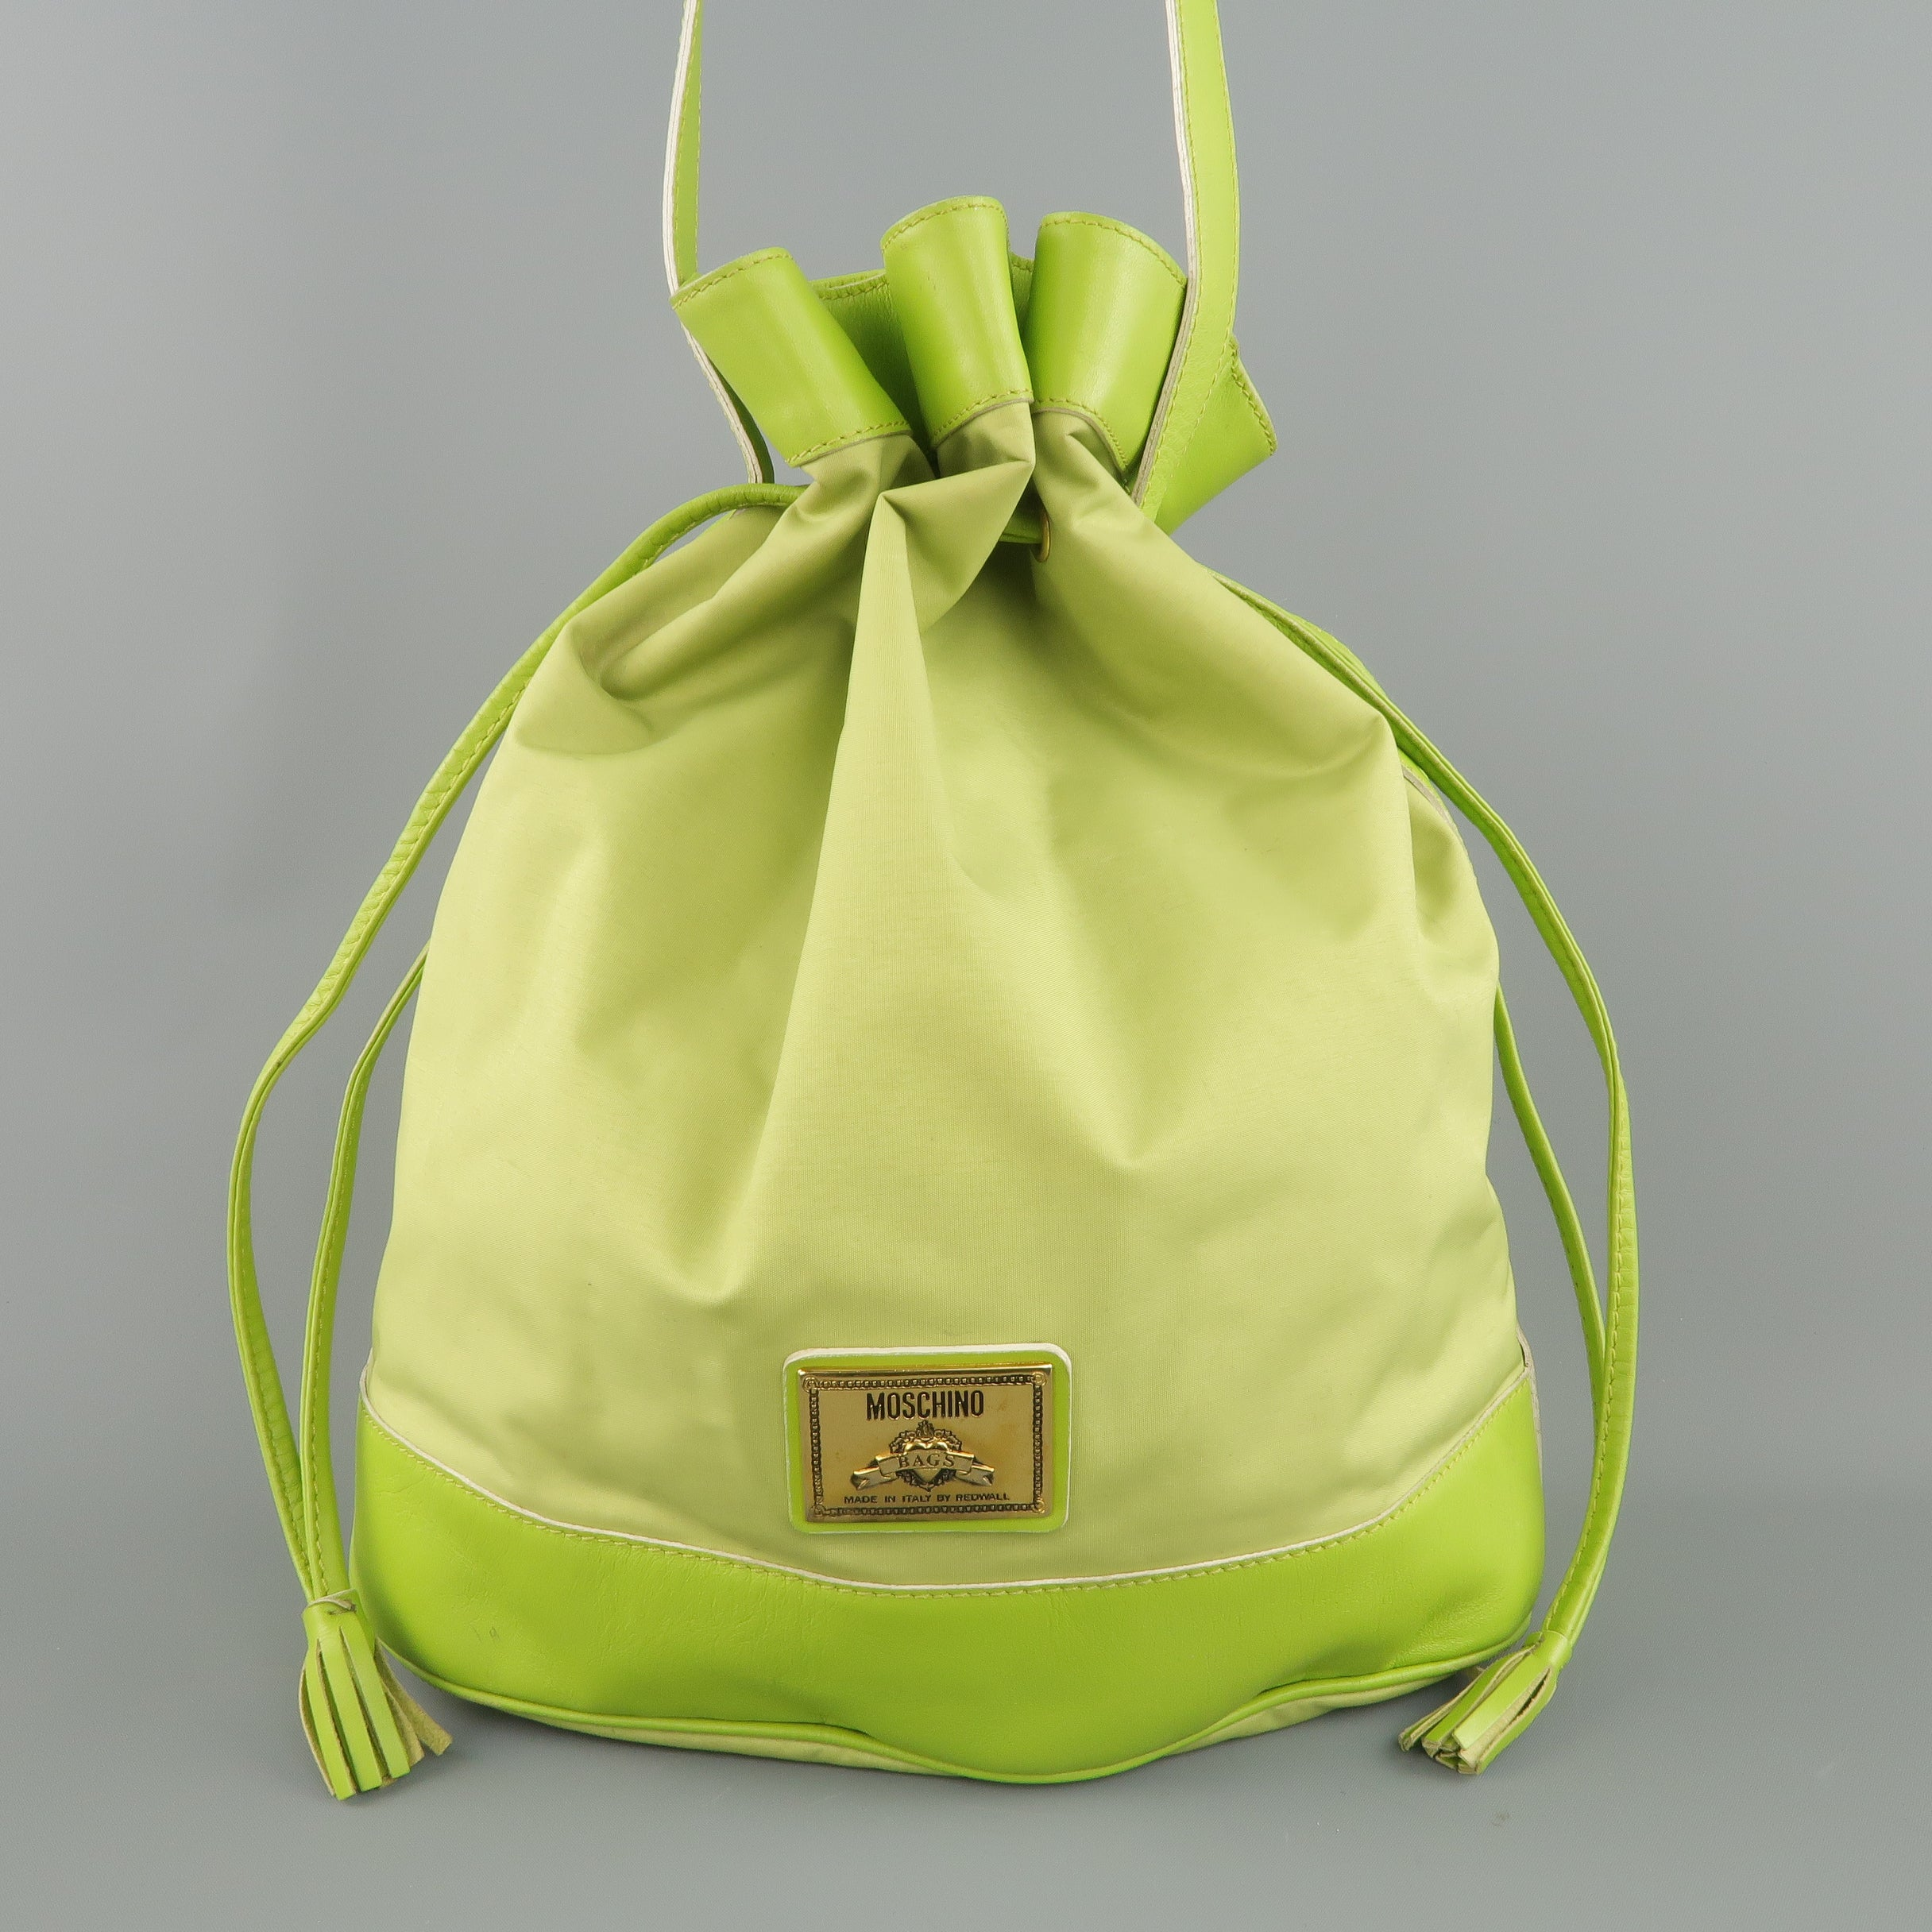 54ebf30299f Vintage 1990s MOSCHINO Green Canvas Drawstring Bucket Handbag For Sale at  1stdibs